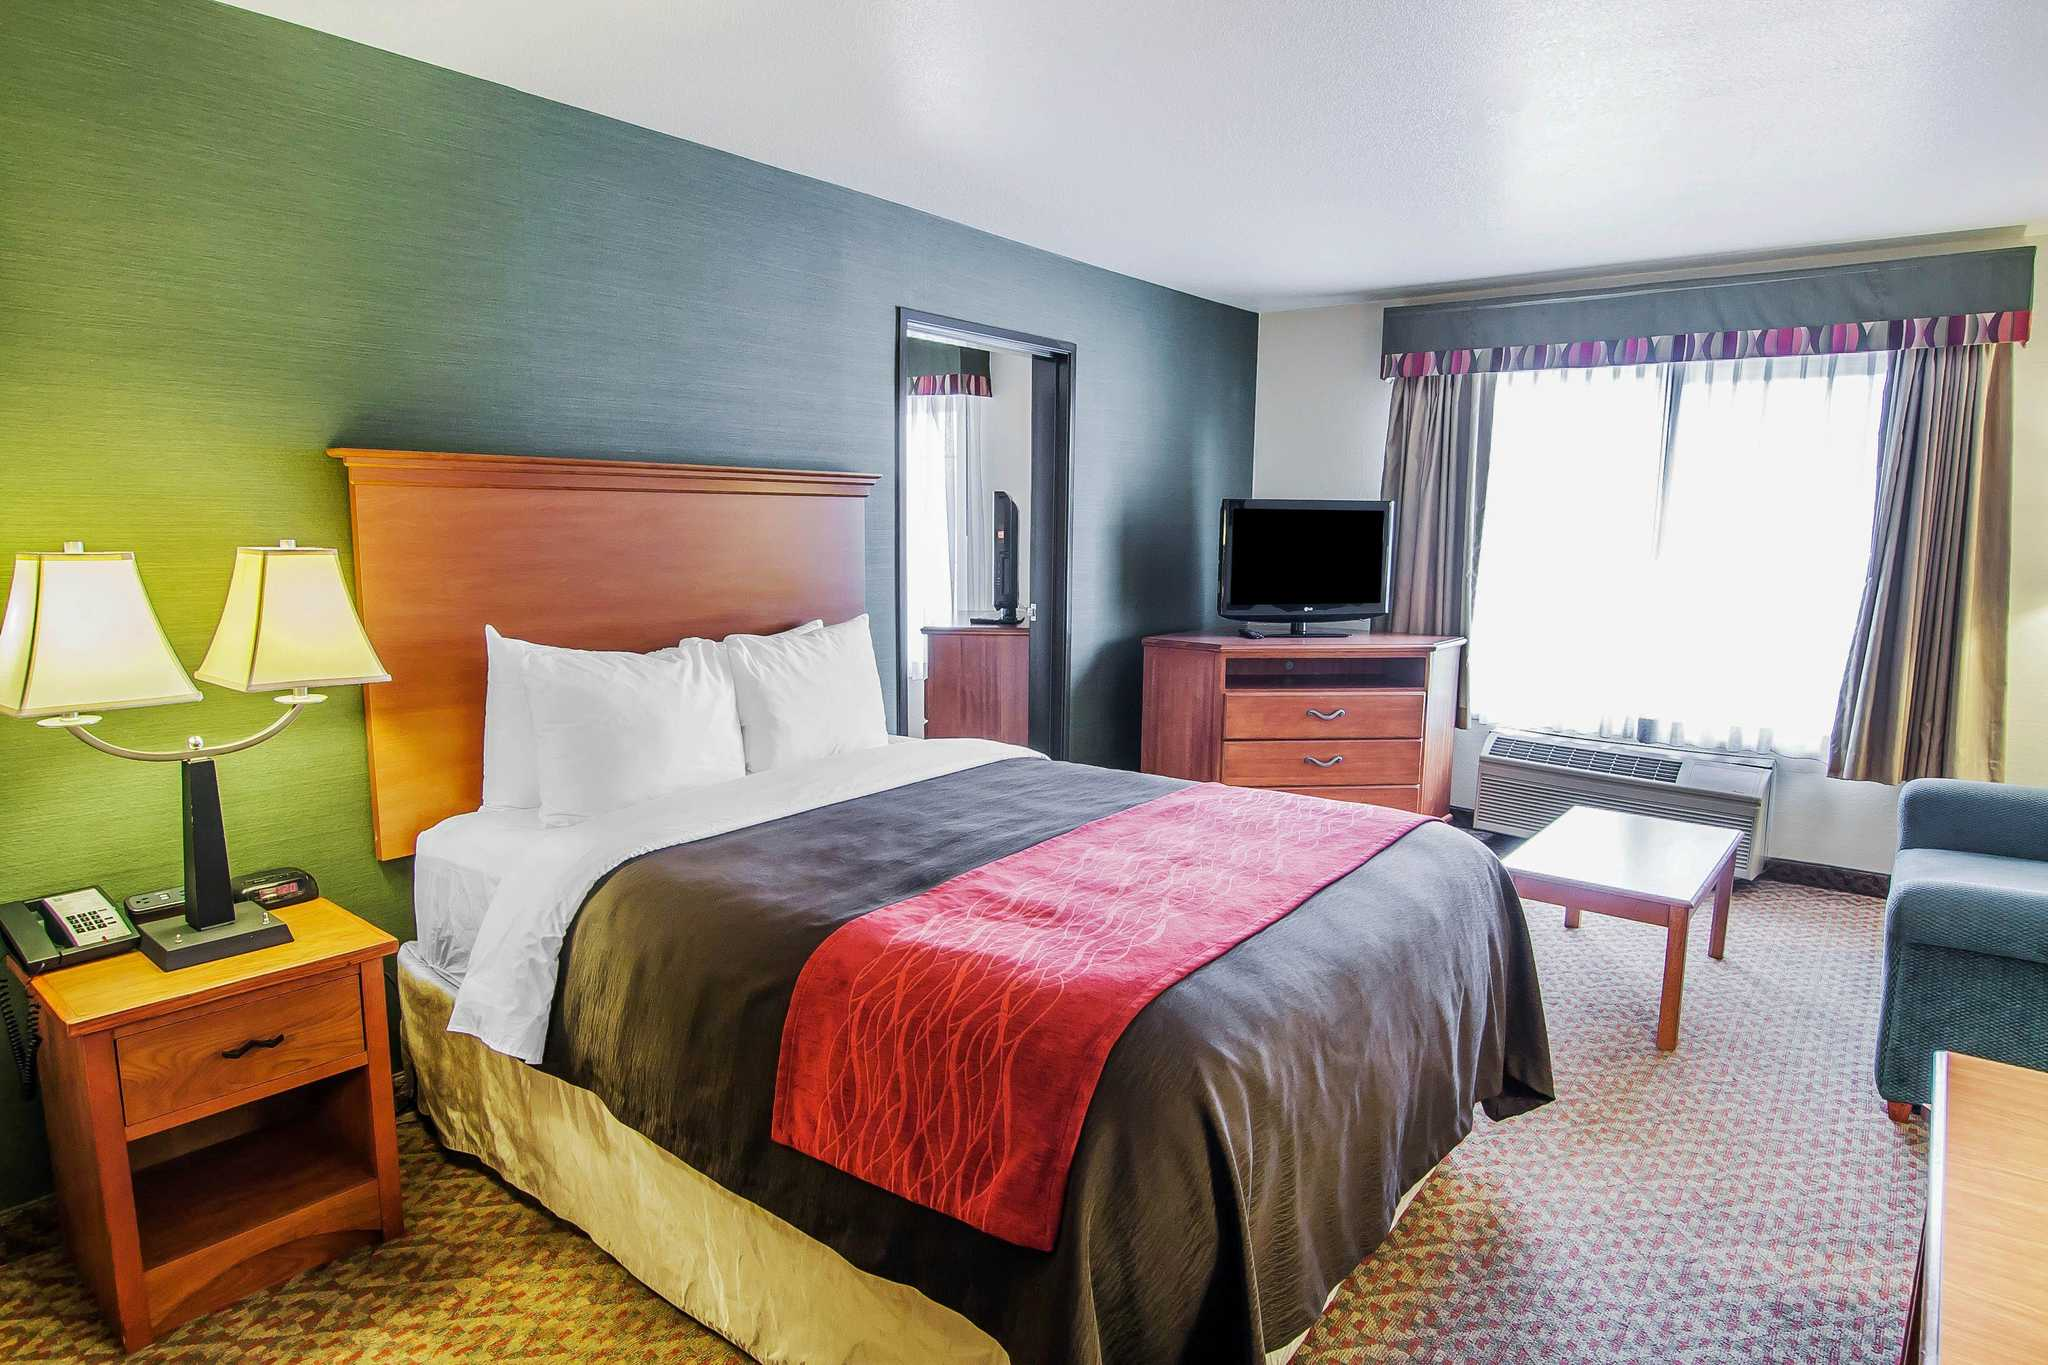 Comfort Inn & Suites image 47